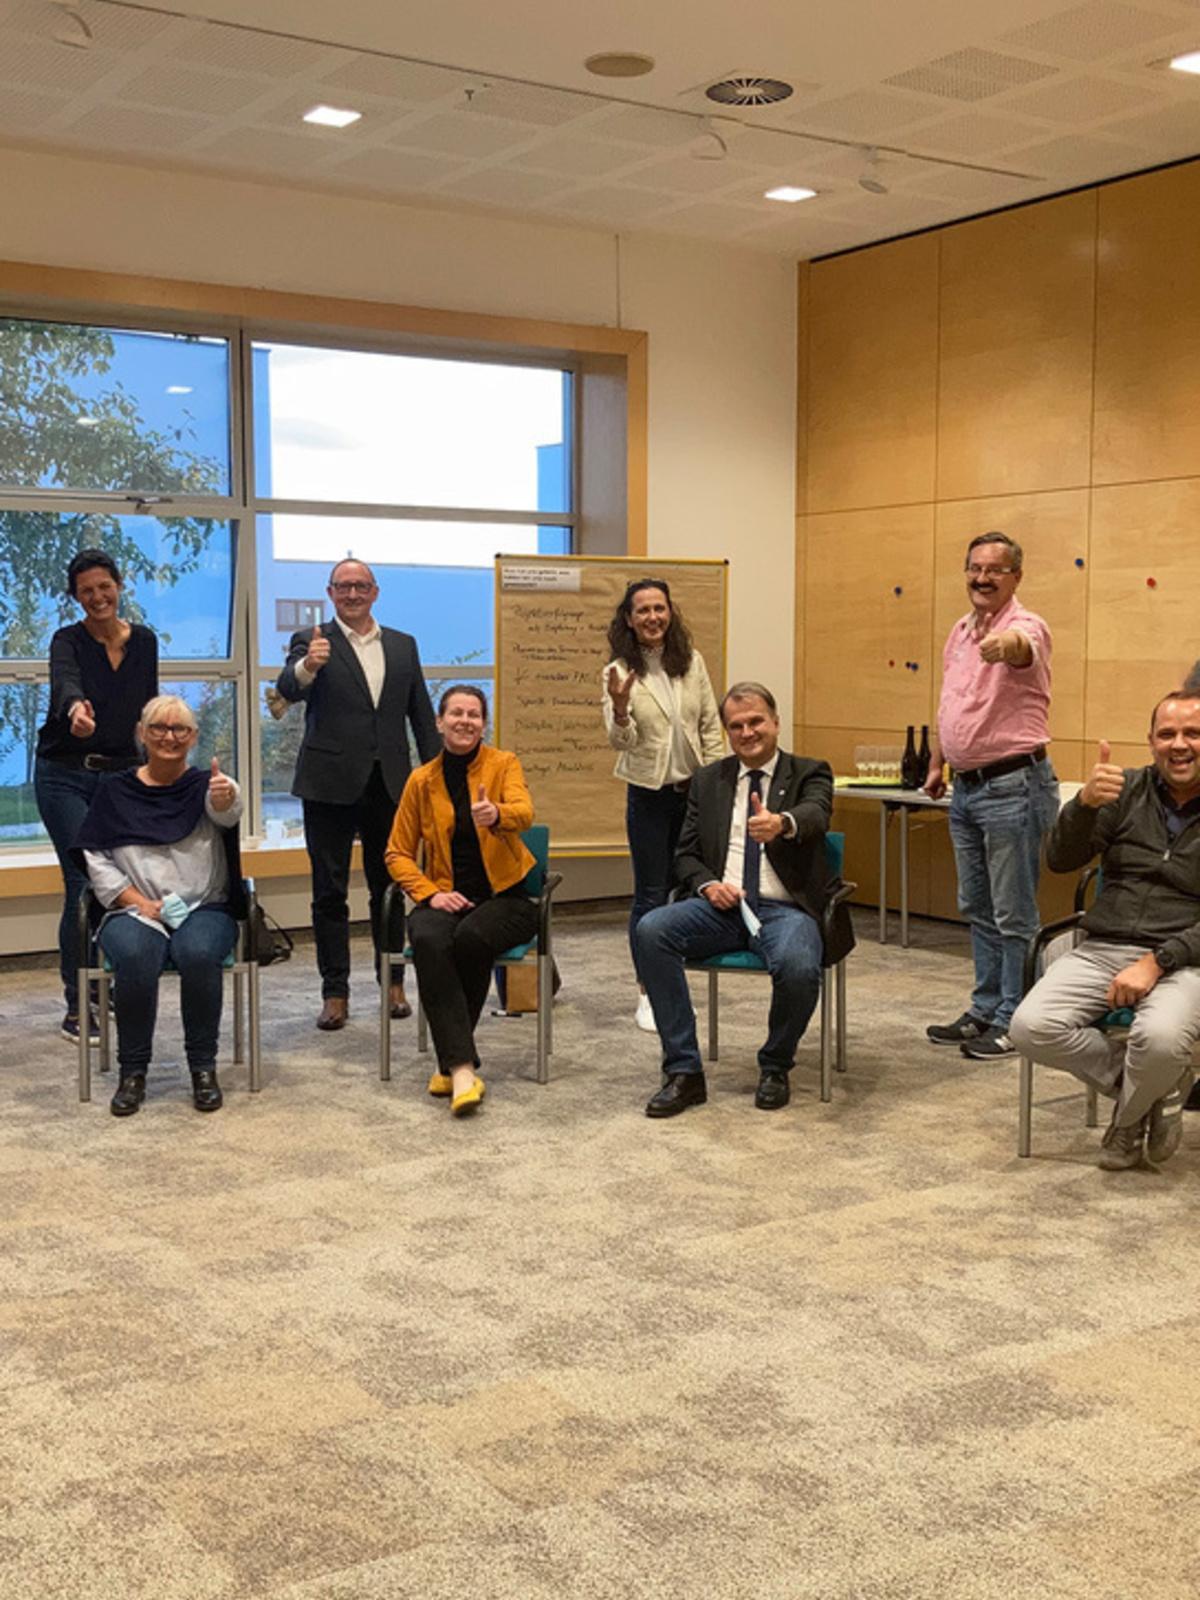 Abschluss Leadership-Lehrgang der Stadt Leonding